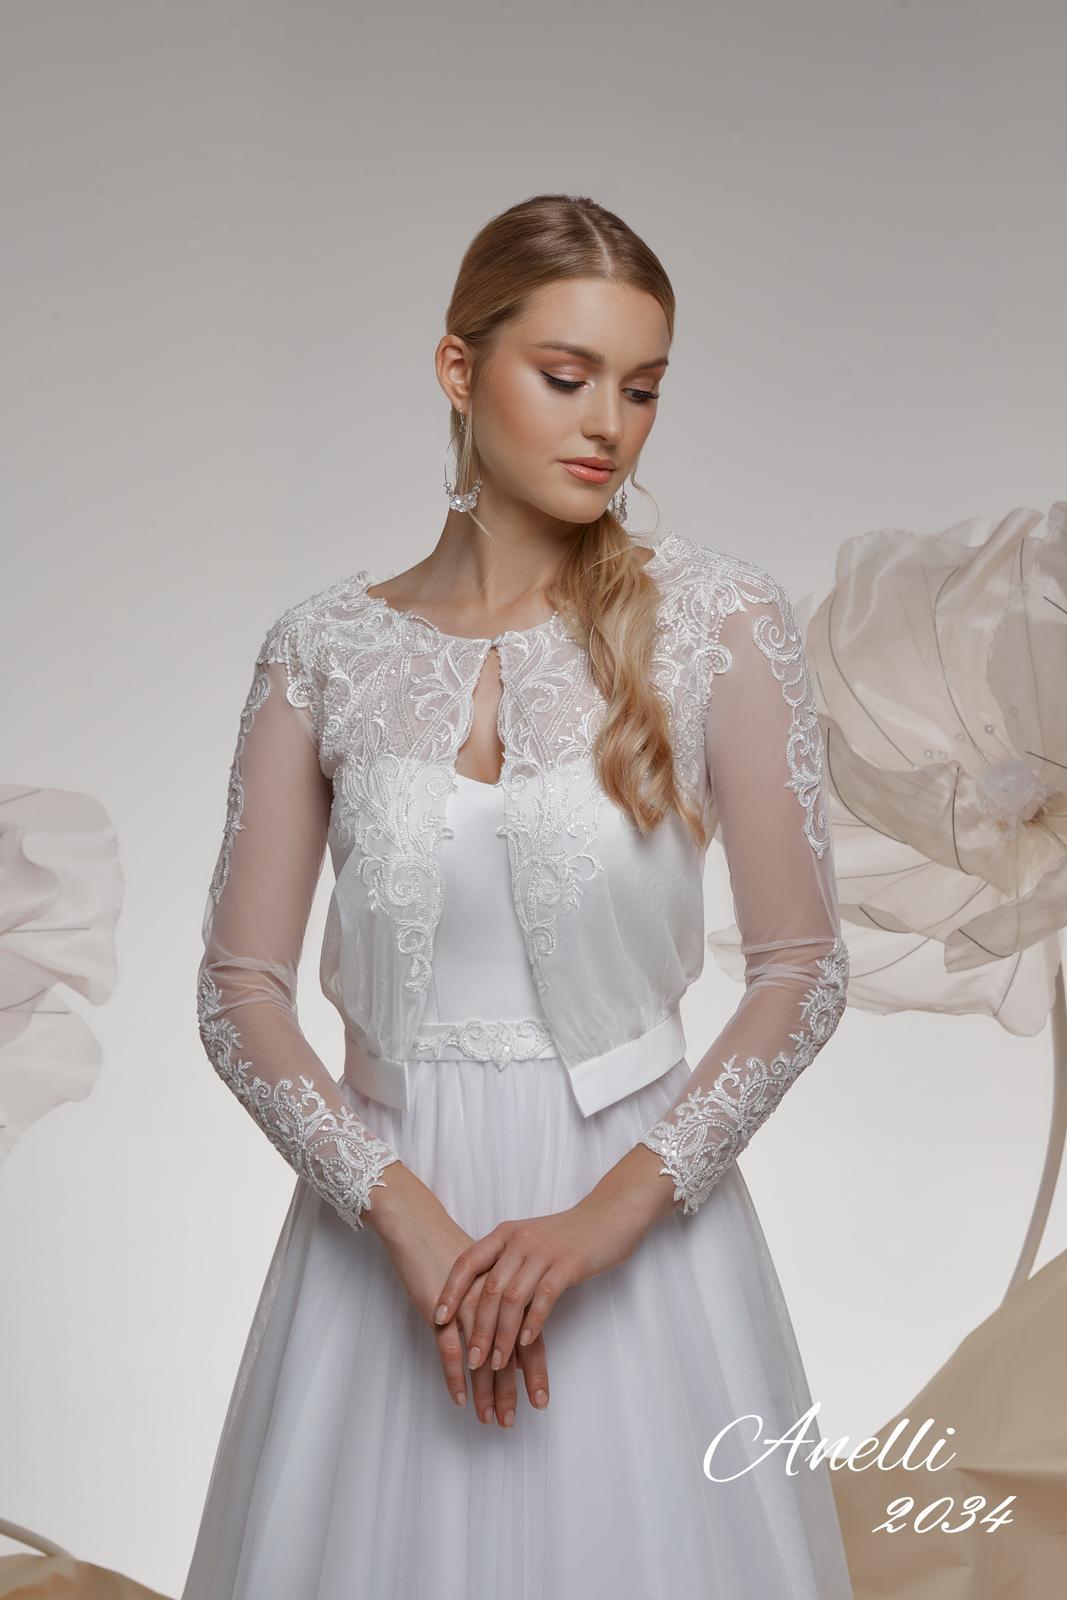 Svadobné šaty - Imagine 2034 - Obrázok č. 4